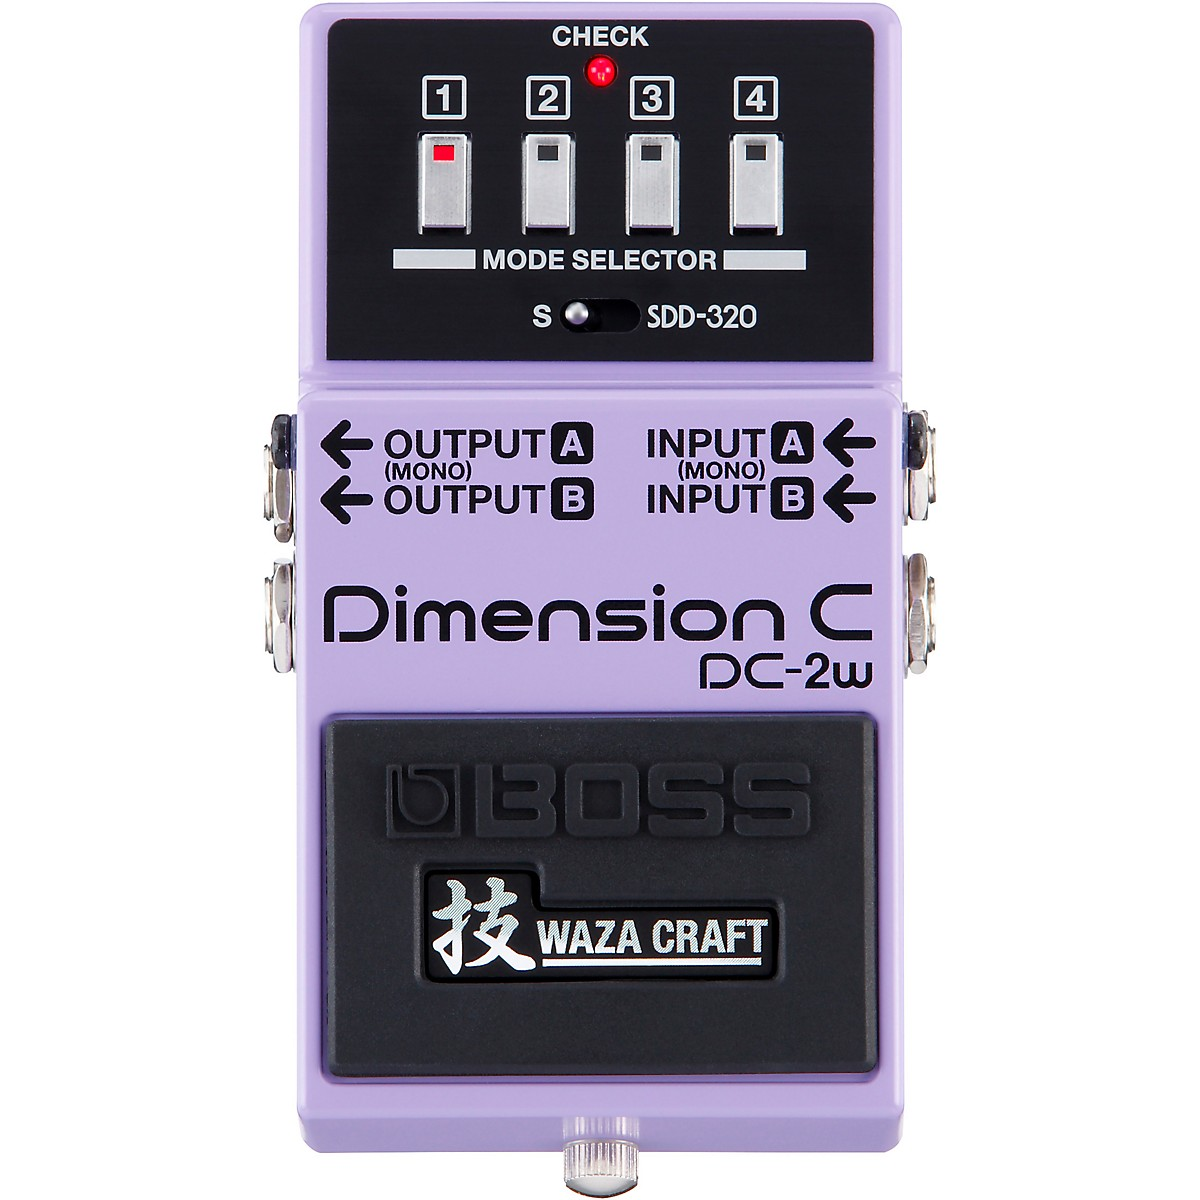 Boss DC-2W Dimension C Waza Craft Guitar Effects Pedal